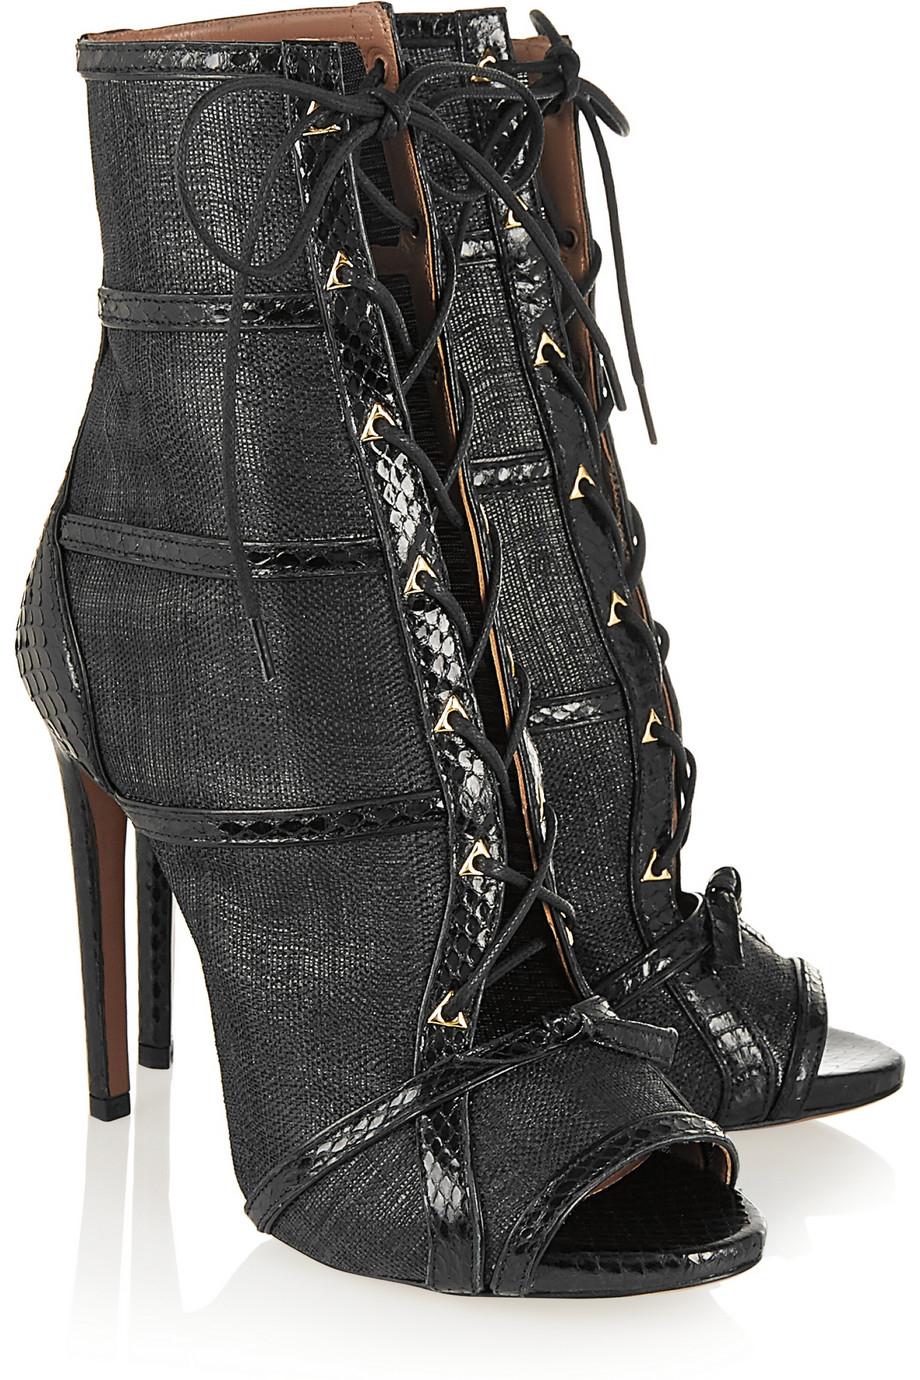 Alaïa Watersnake-Trimmed Raffia Ankle Boots in Black